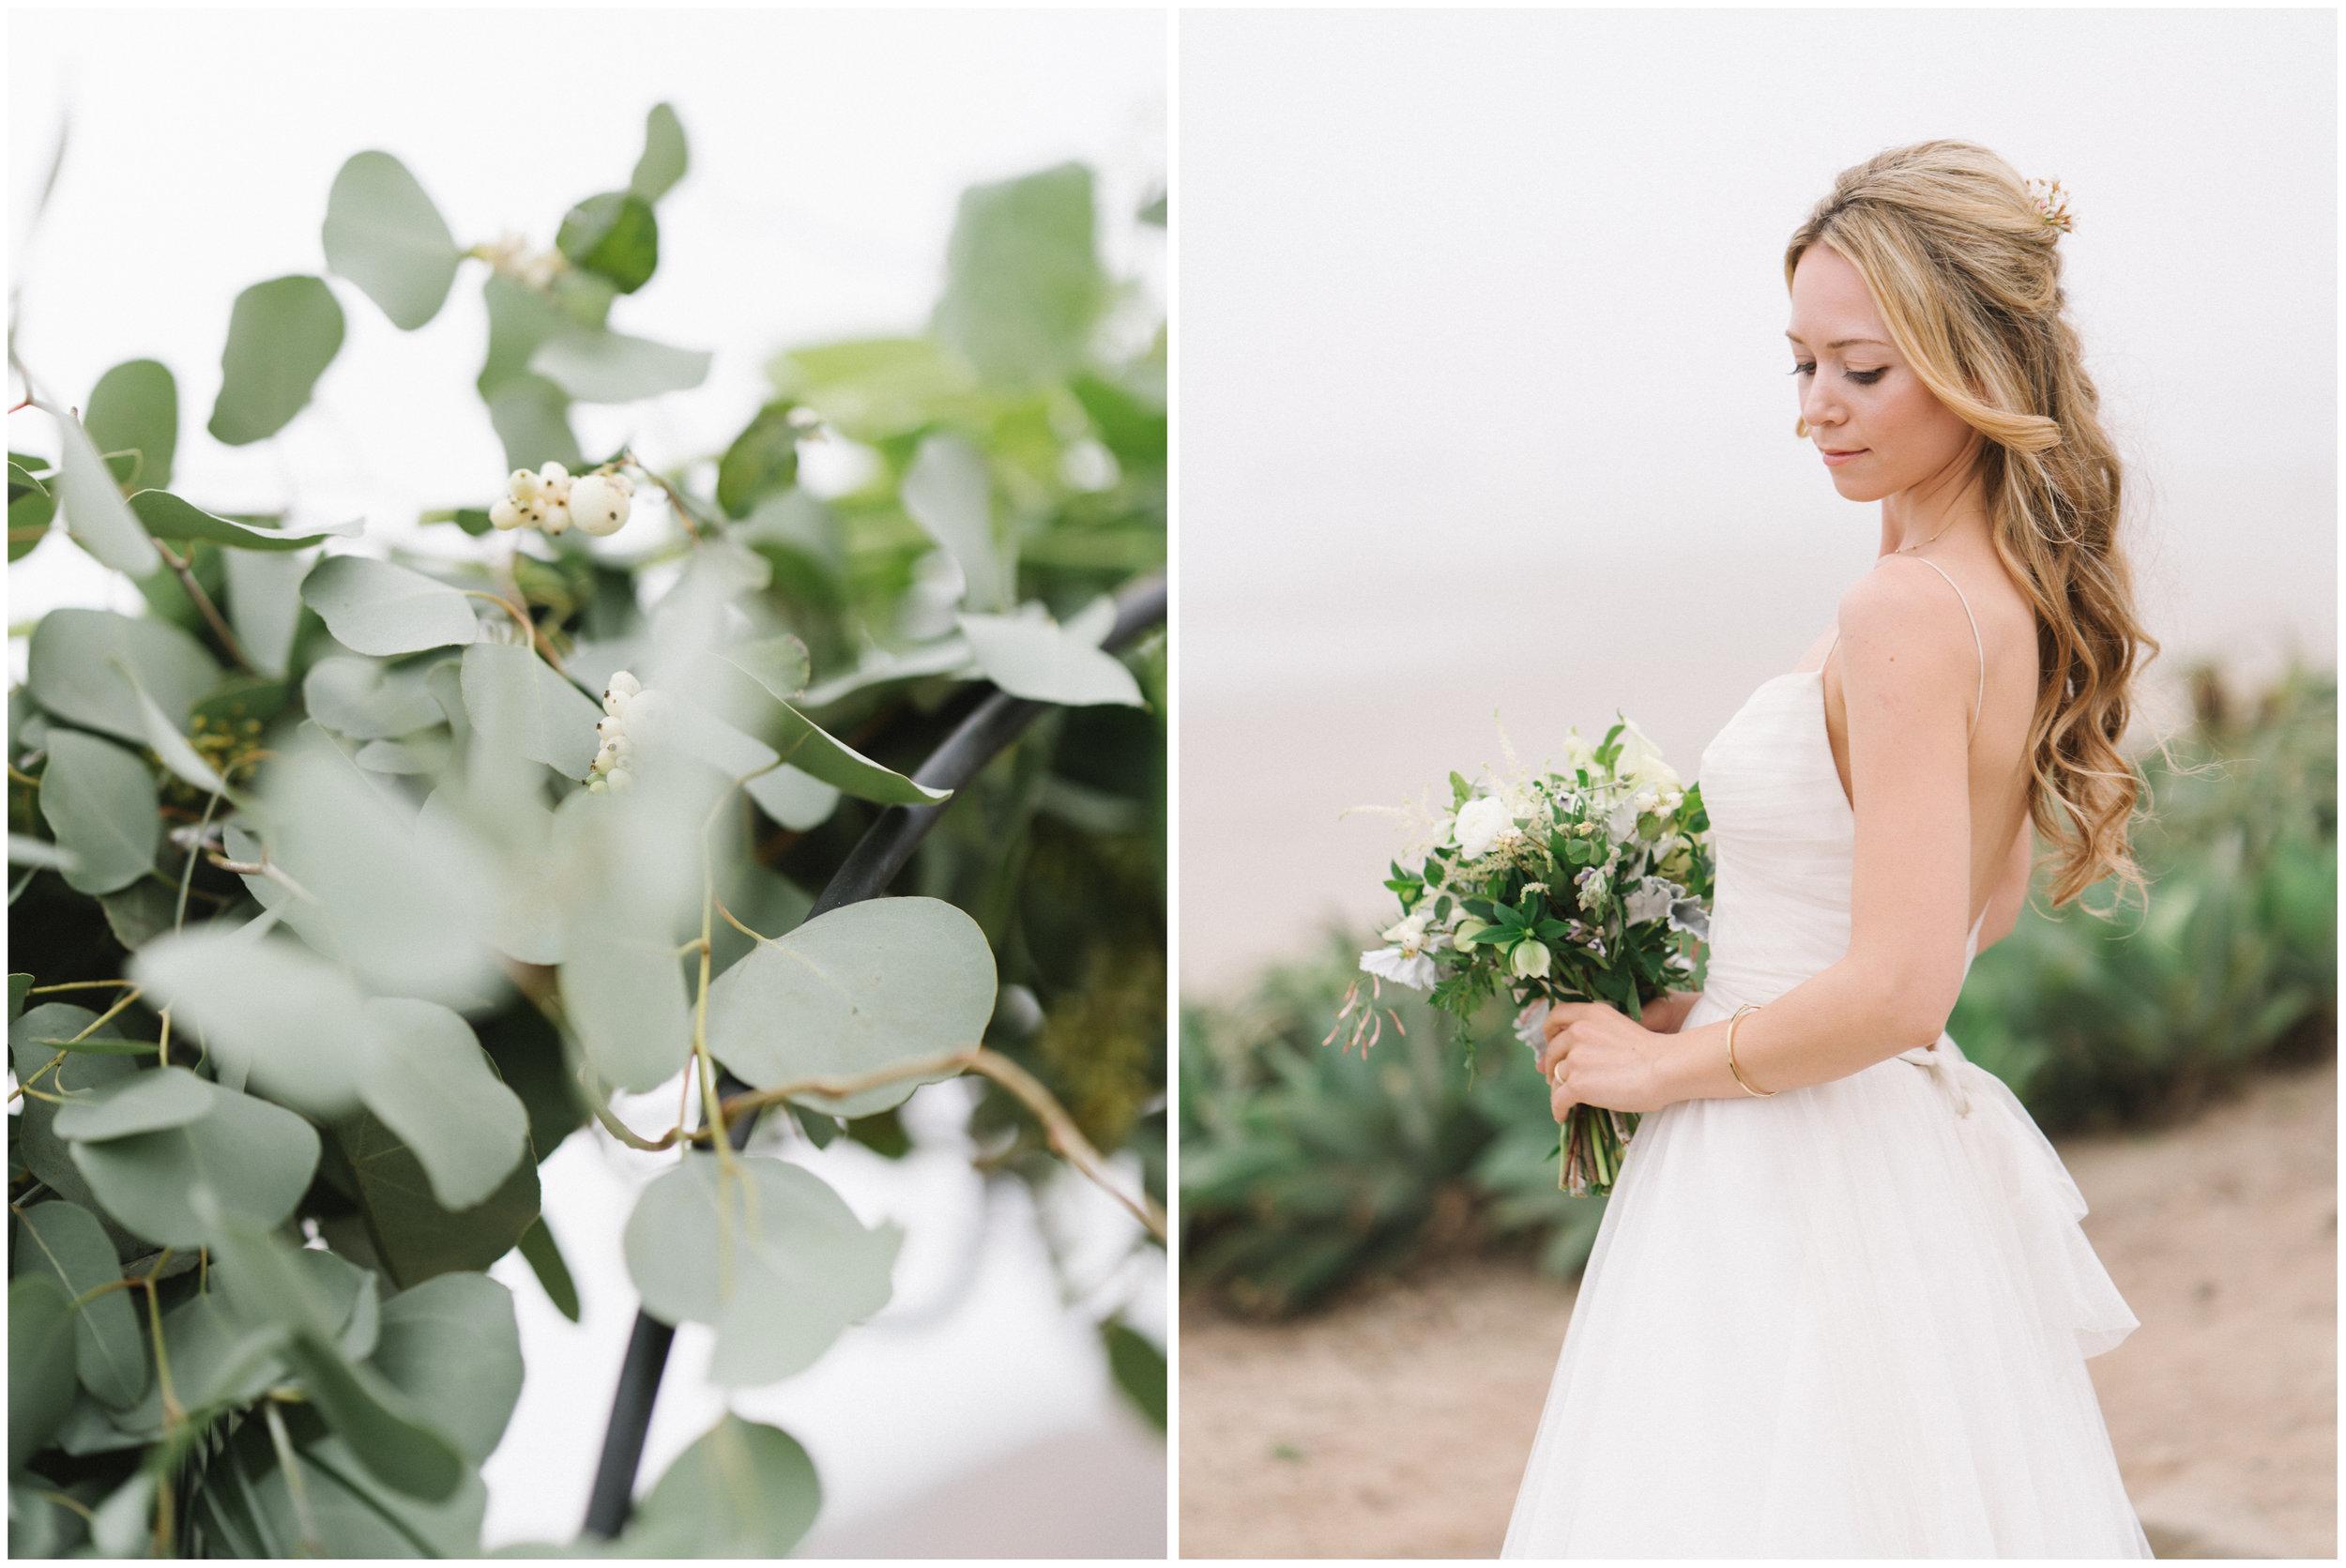 Santa Barbara Elopement Wedding Photographer - Pinnel Photography-01.jpg